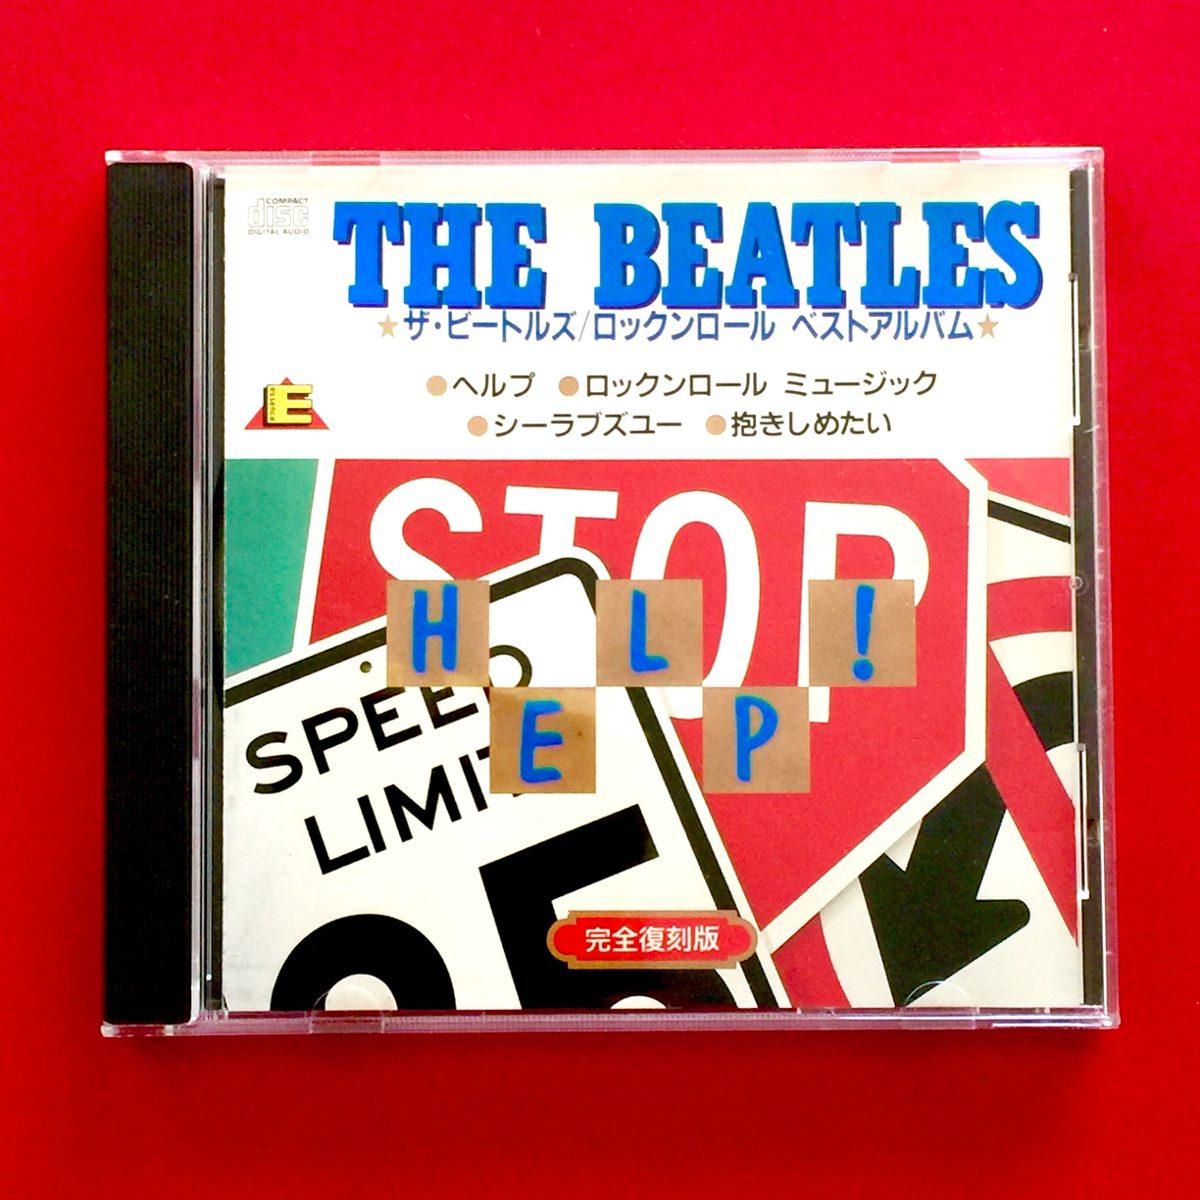 The Beatles Help Cd Album Japones Impecable Edicion Rara - $ 390.00 en Mercado Libre